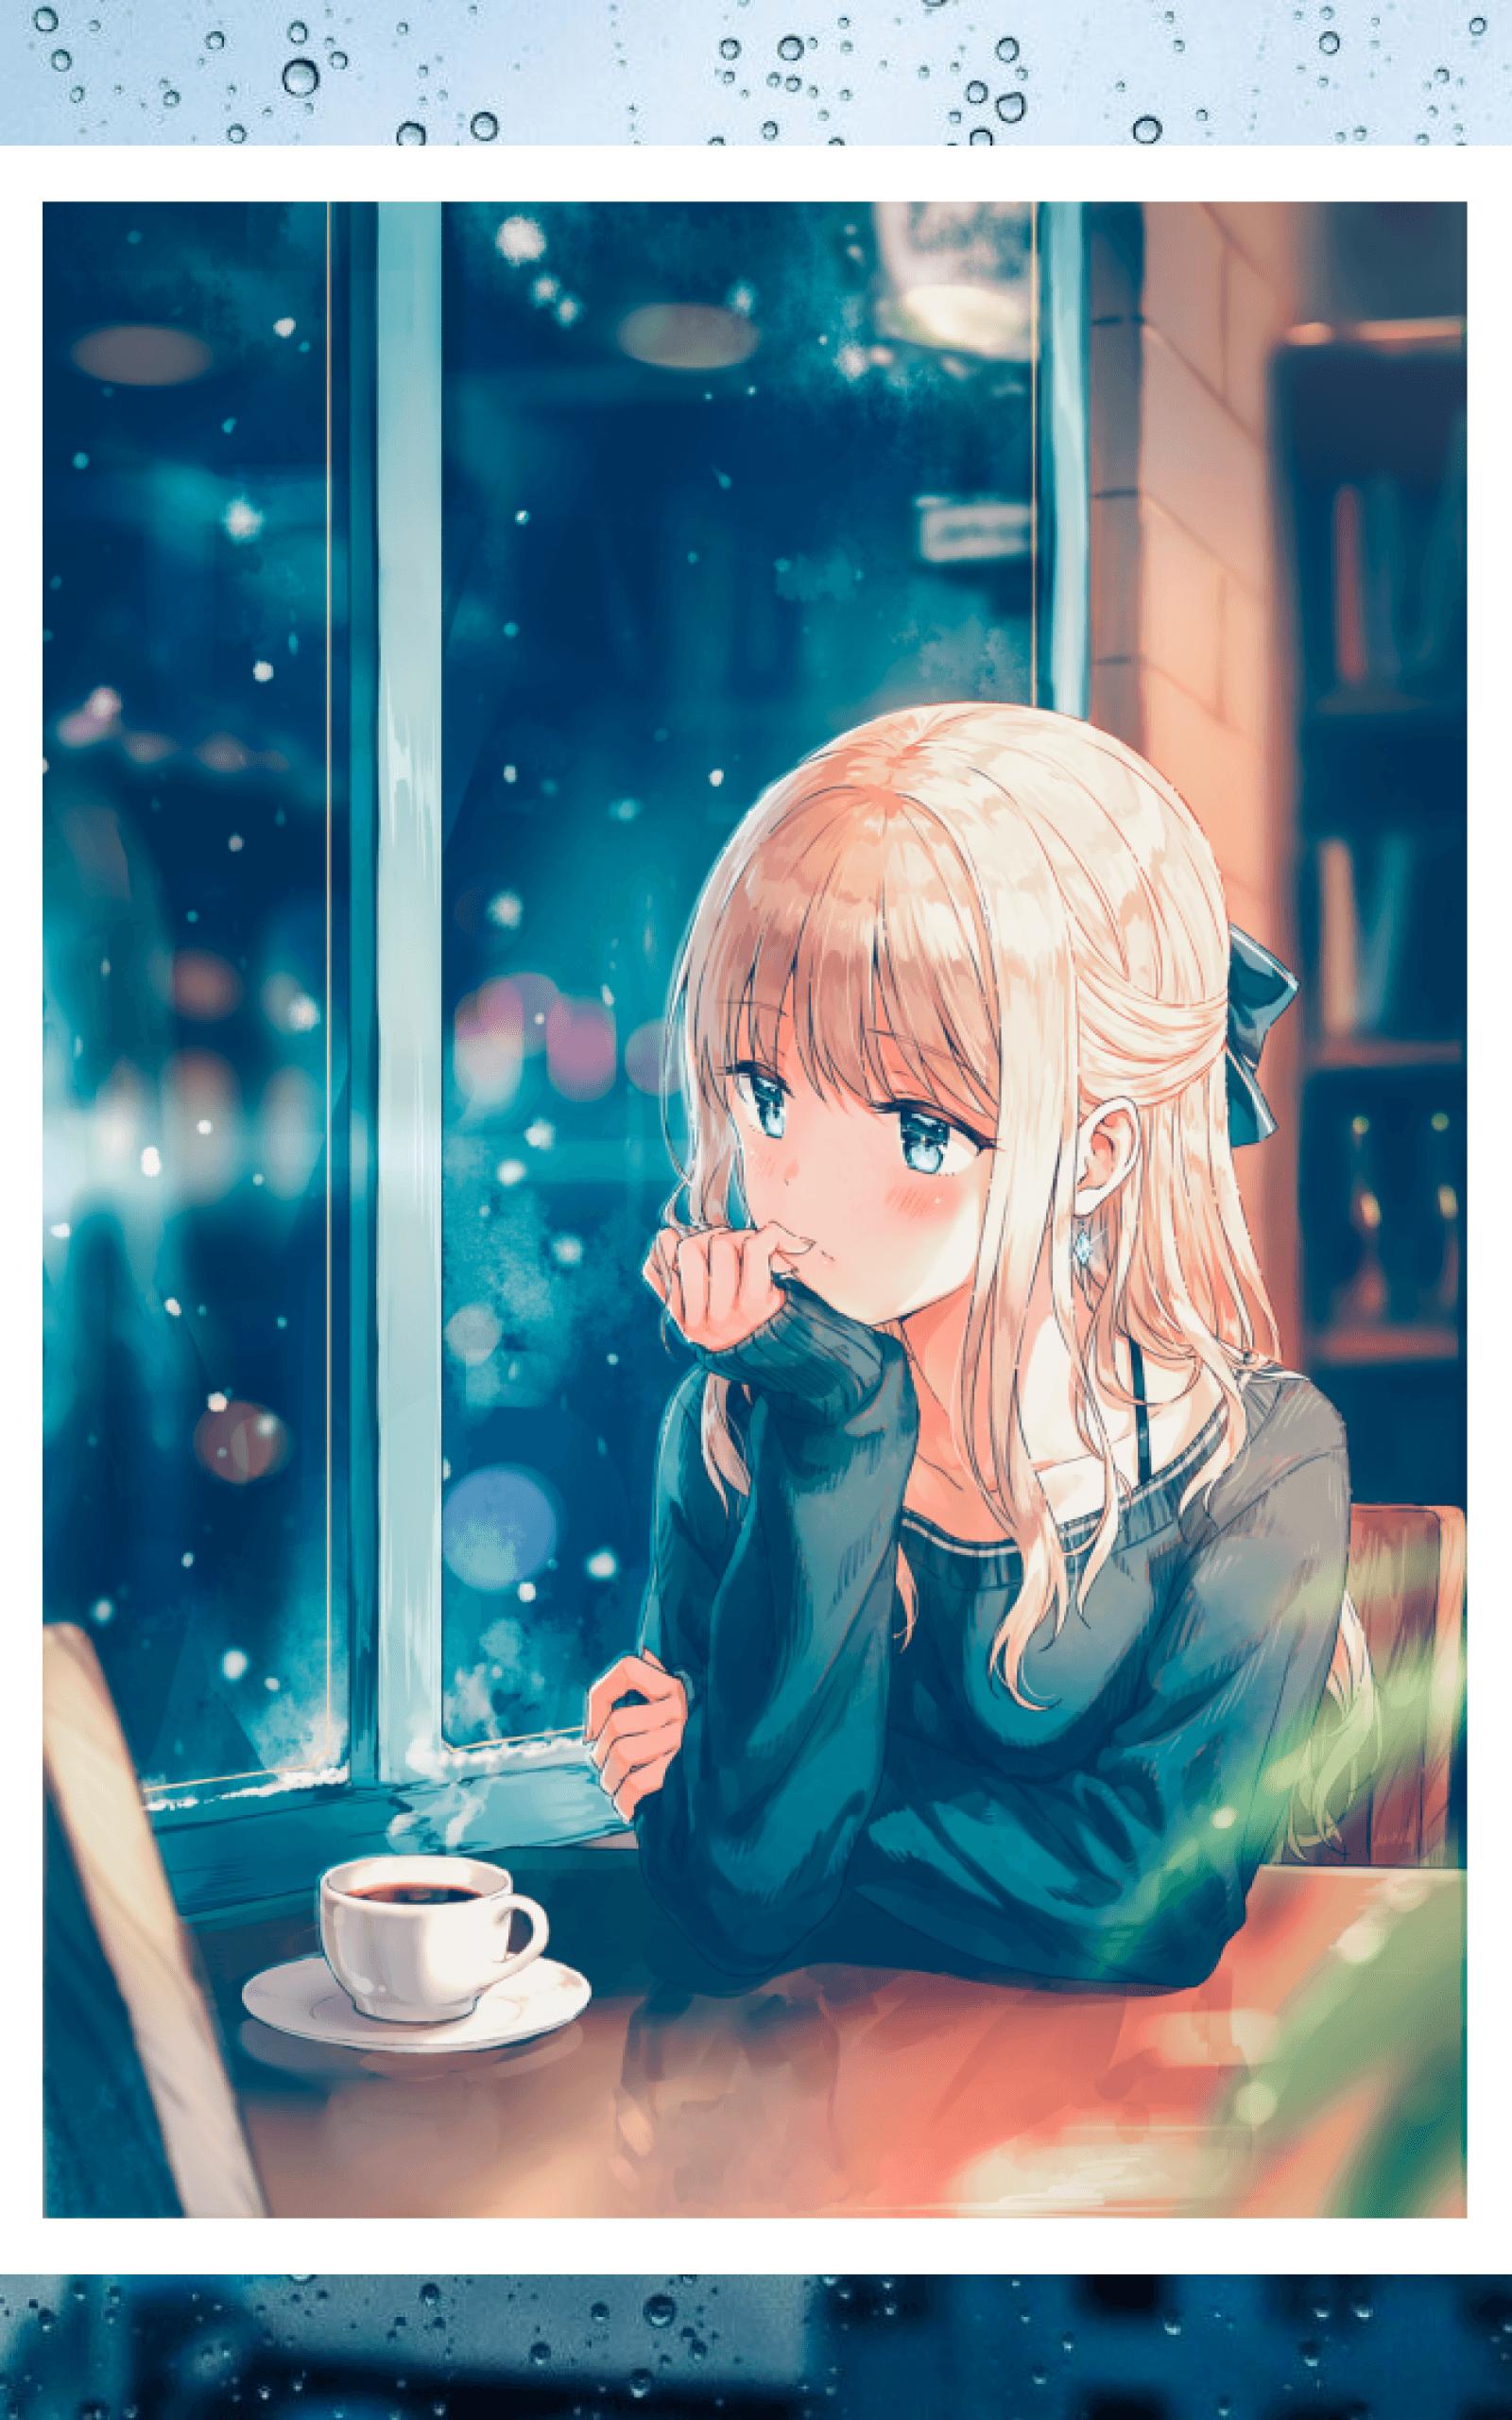 Anime Rain Wallpapers - Wallpaper Cave